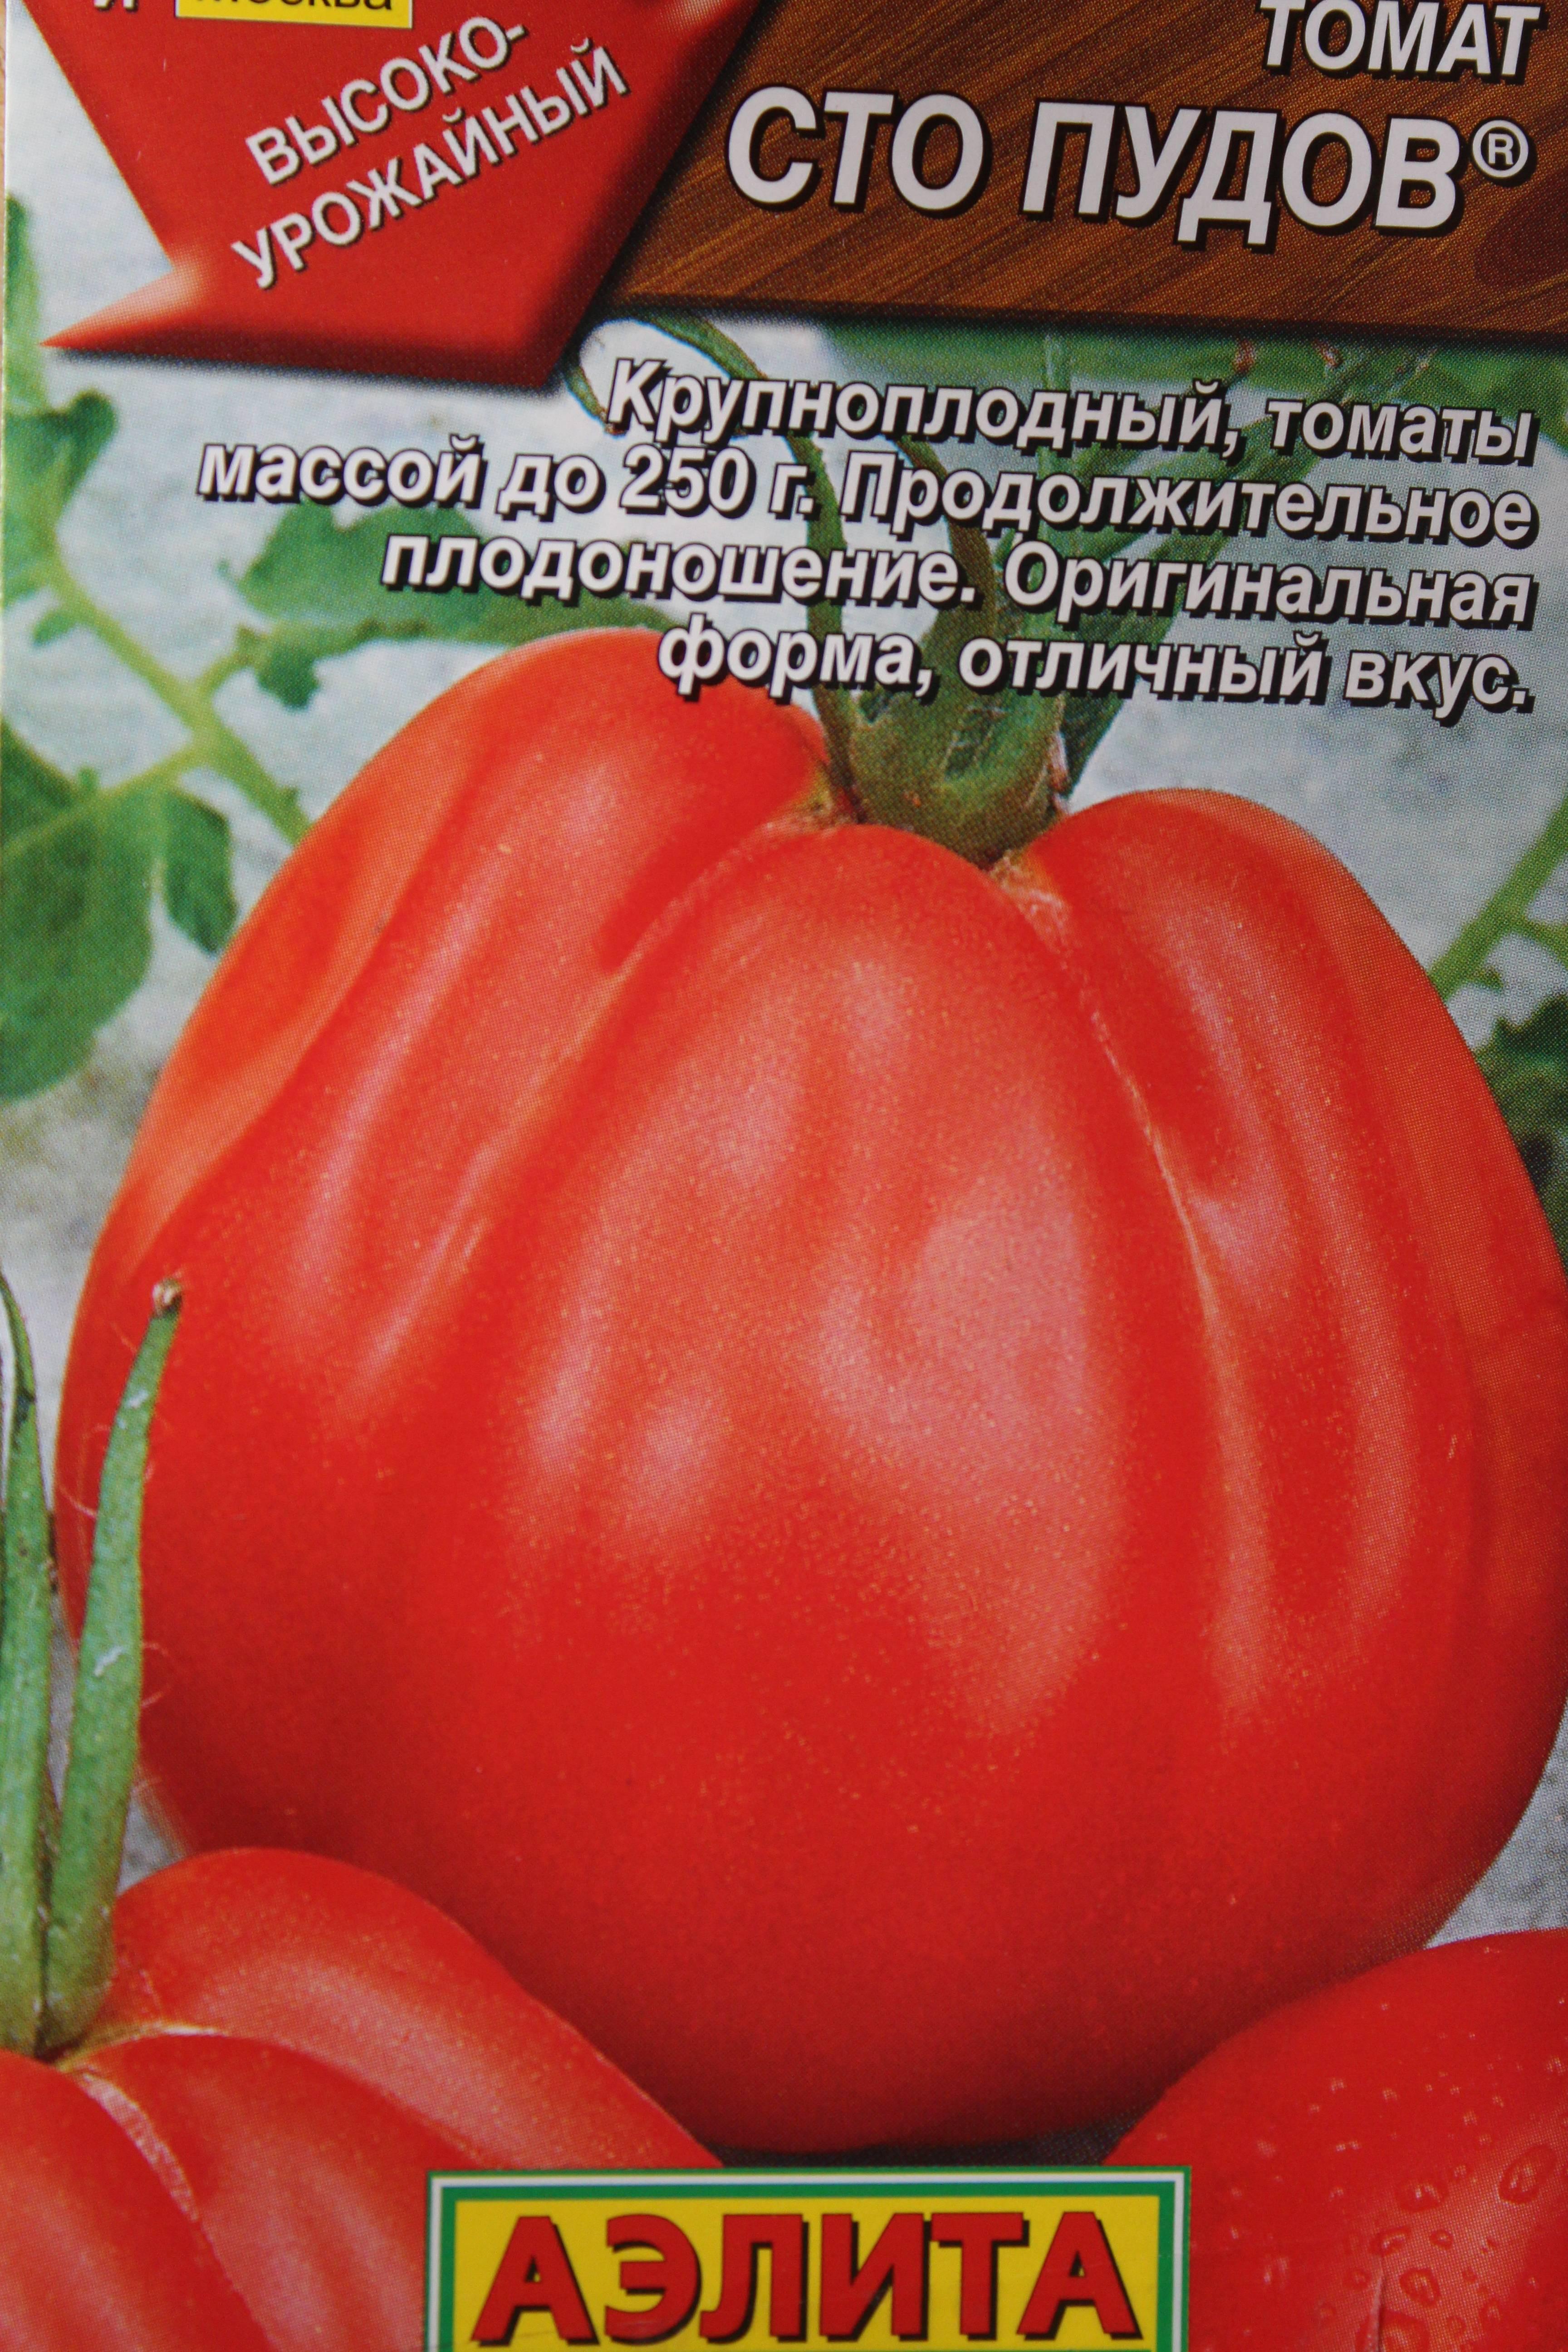 Томат 100 Пудов: характеристика и описание сорта